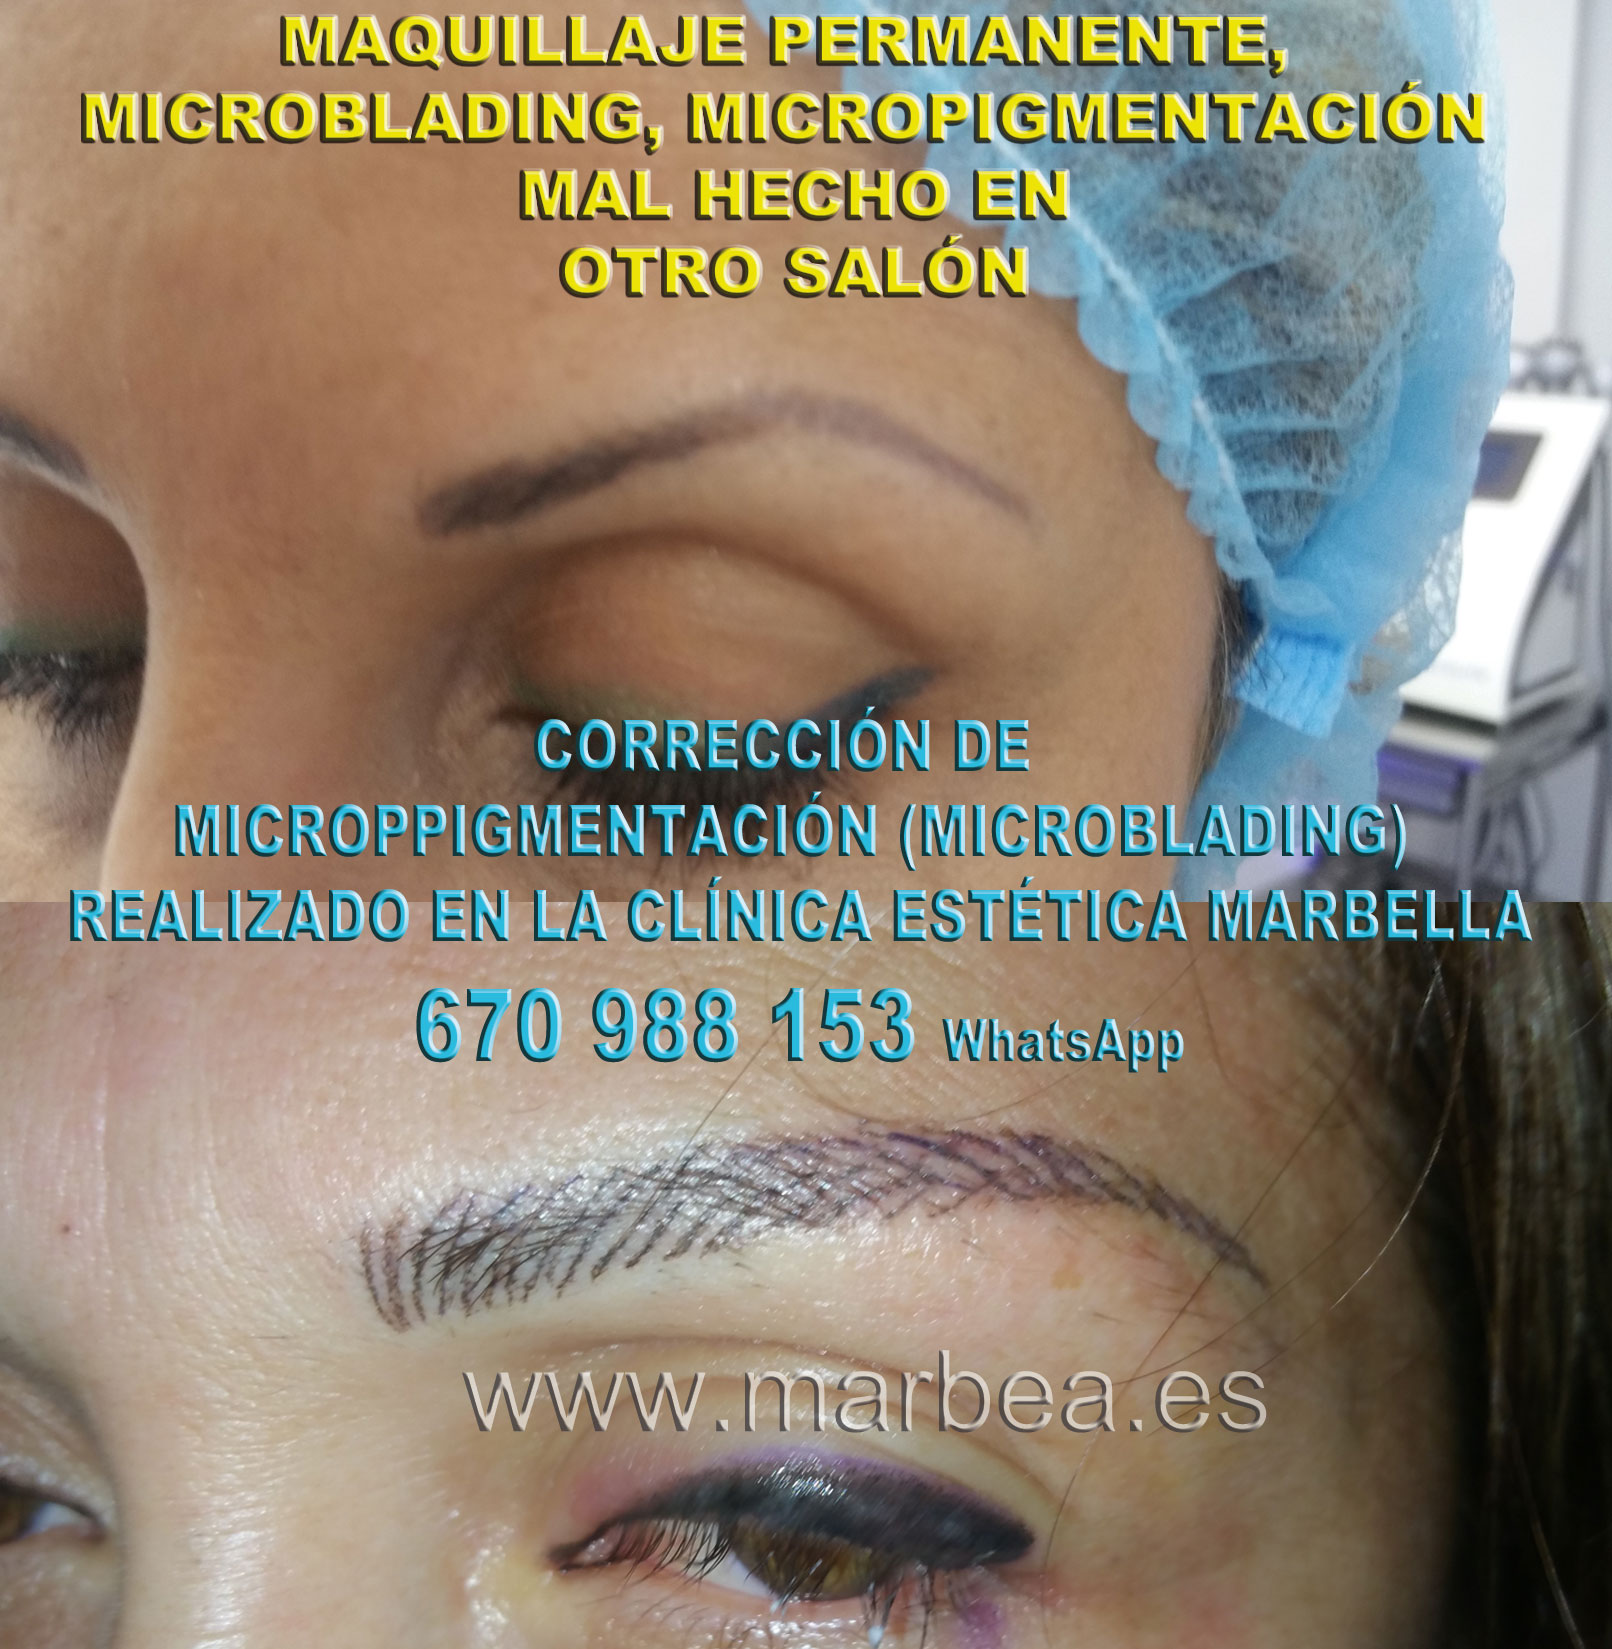 CORREGIR TATUAJE DE CEJAS clínica estética maquillaje semipermanente ofrece como aclarar la micropigmentación cejas,micropigmentación correctiva cejas mal hecha